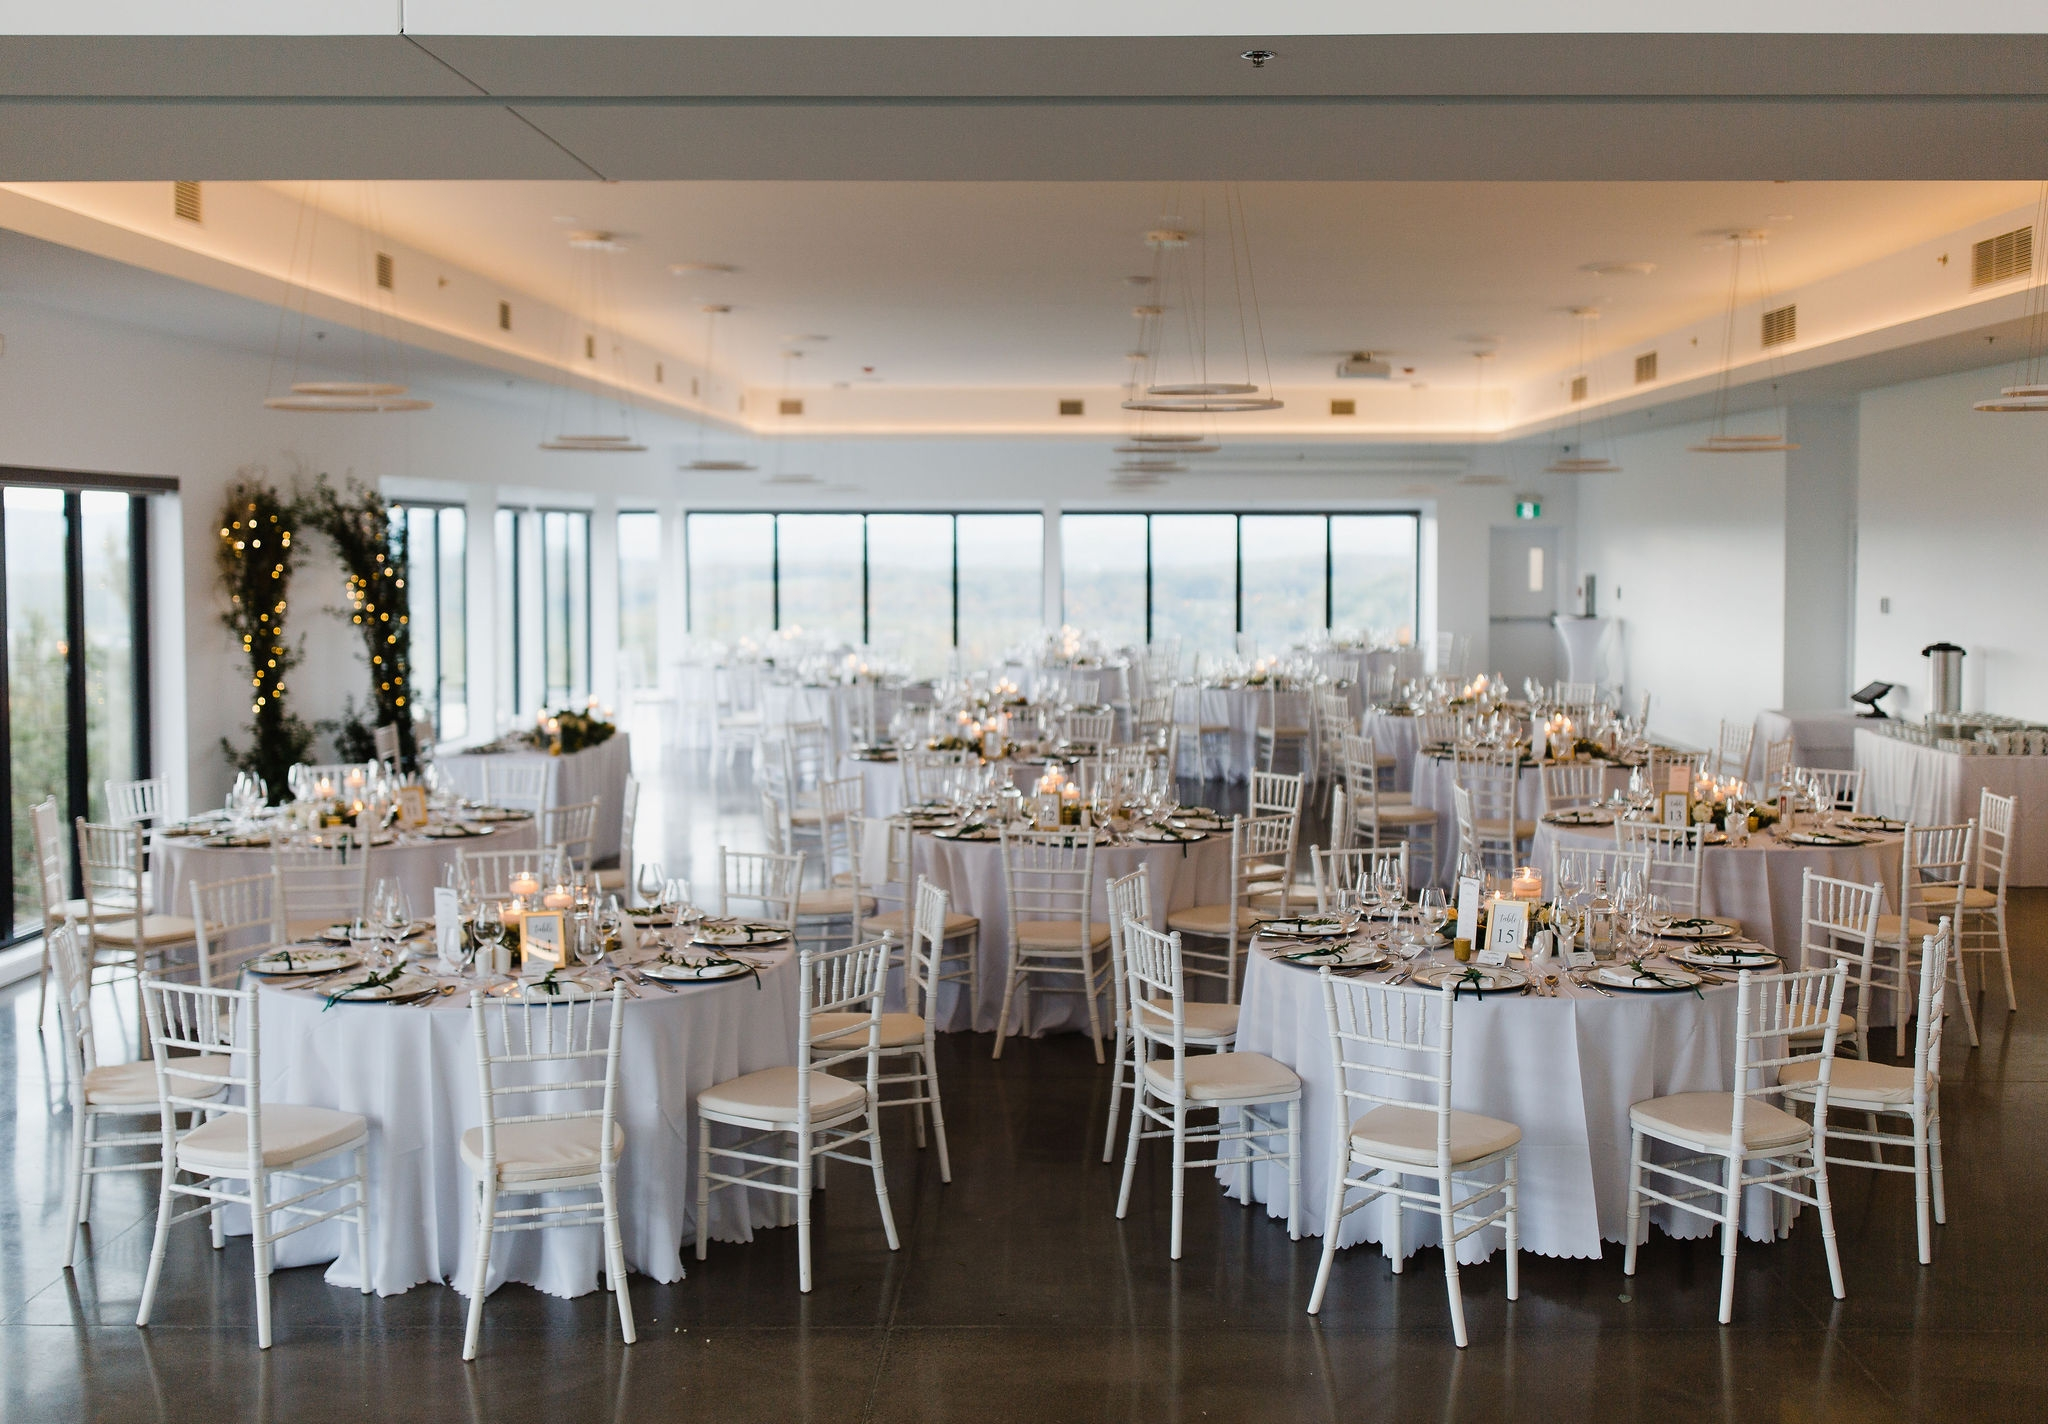 Salle pour mariage_BlogueFoudamour_SoniaBourdon